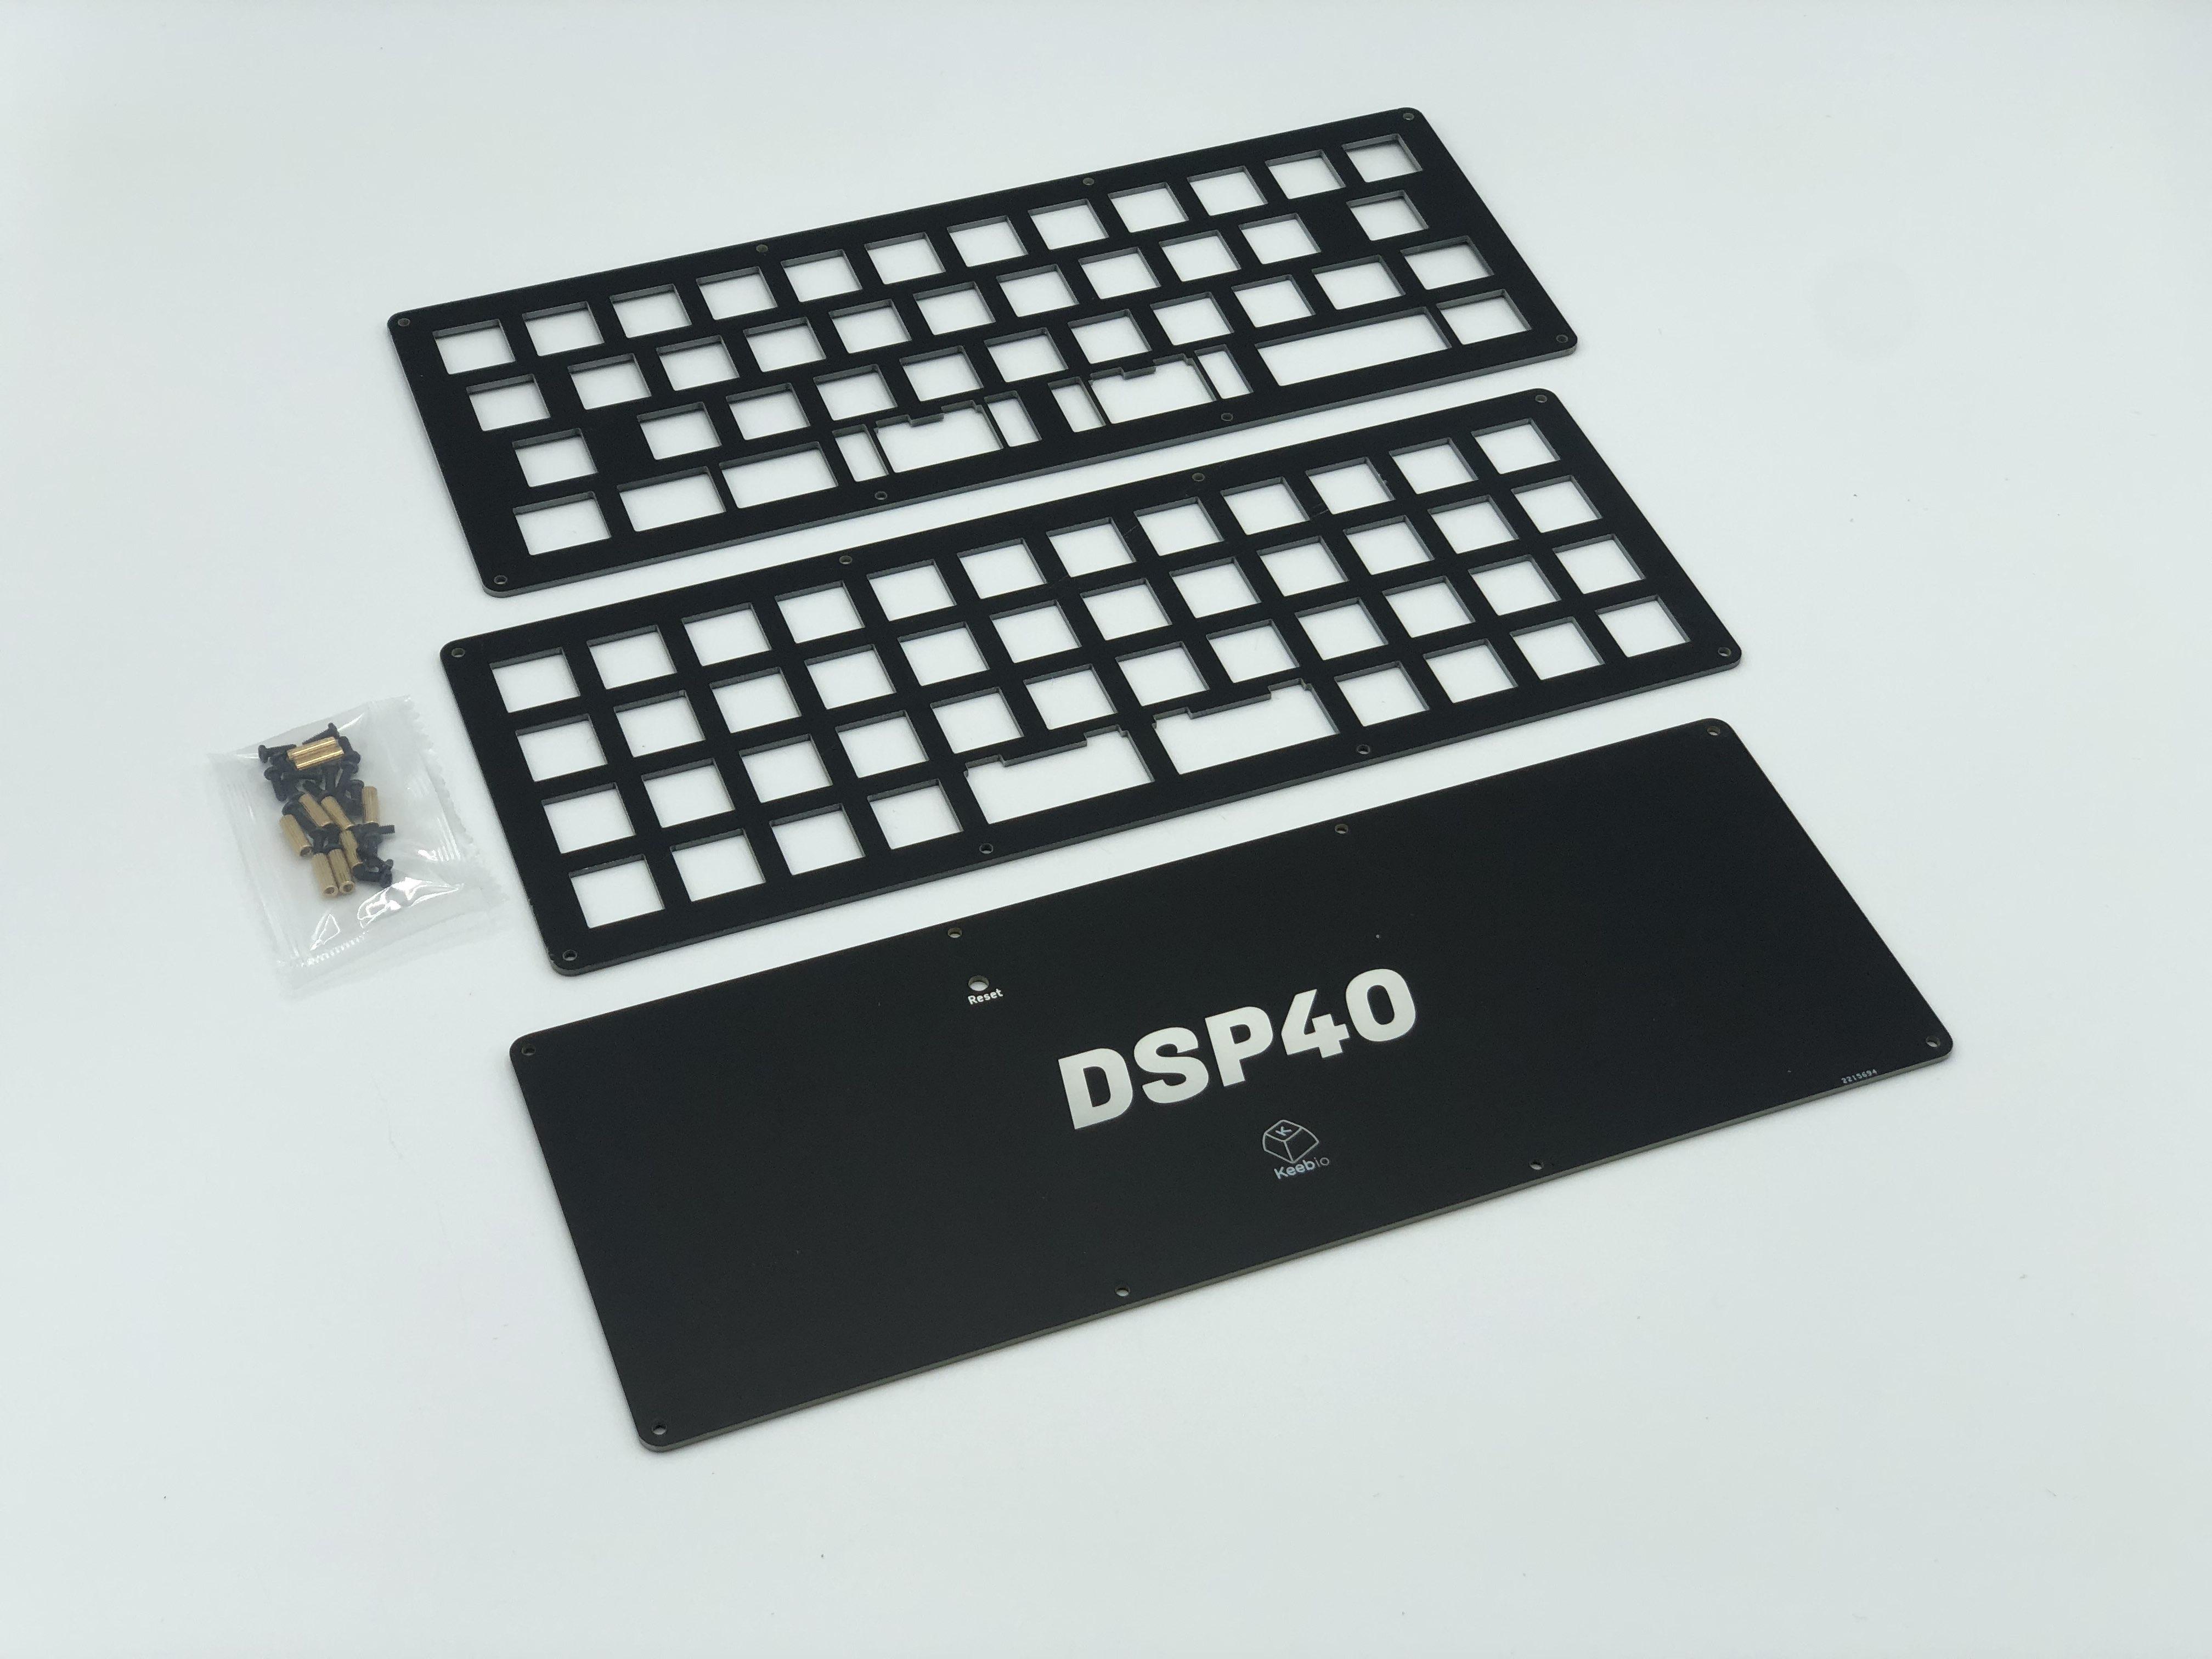 DSP40